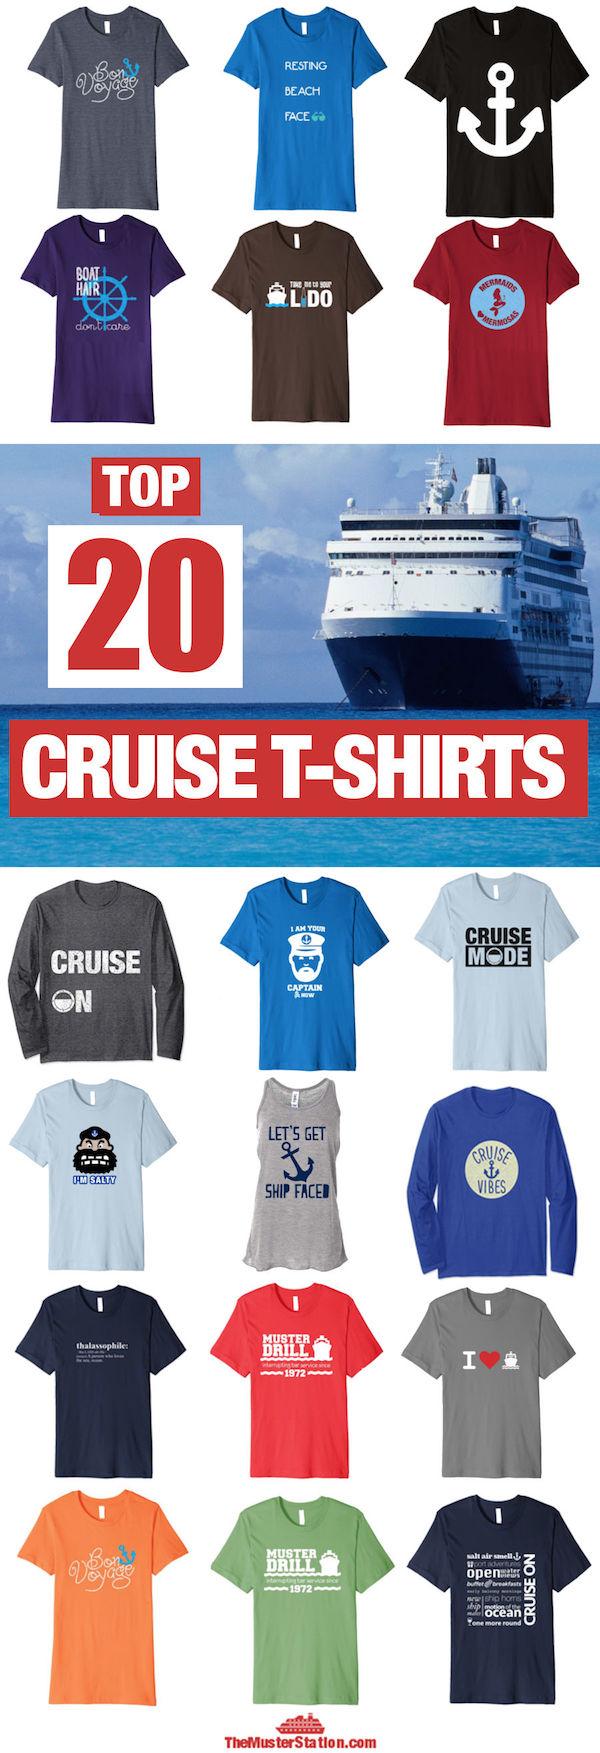 Top Cruise Shirts